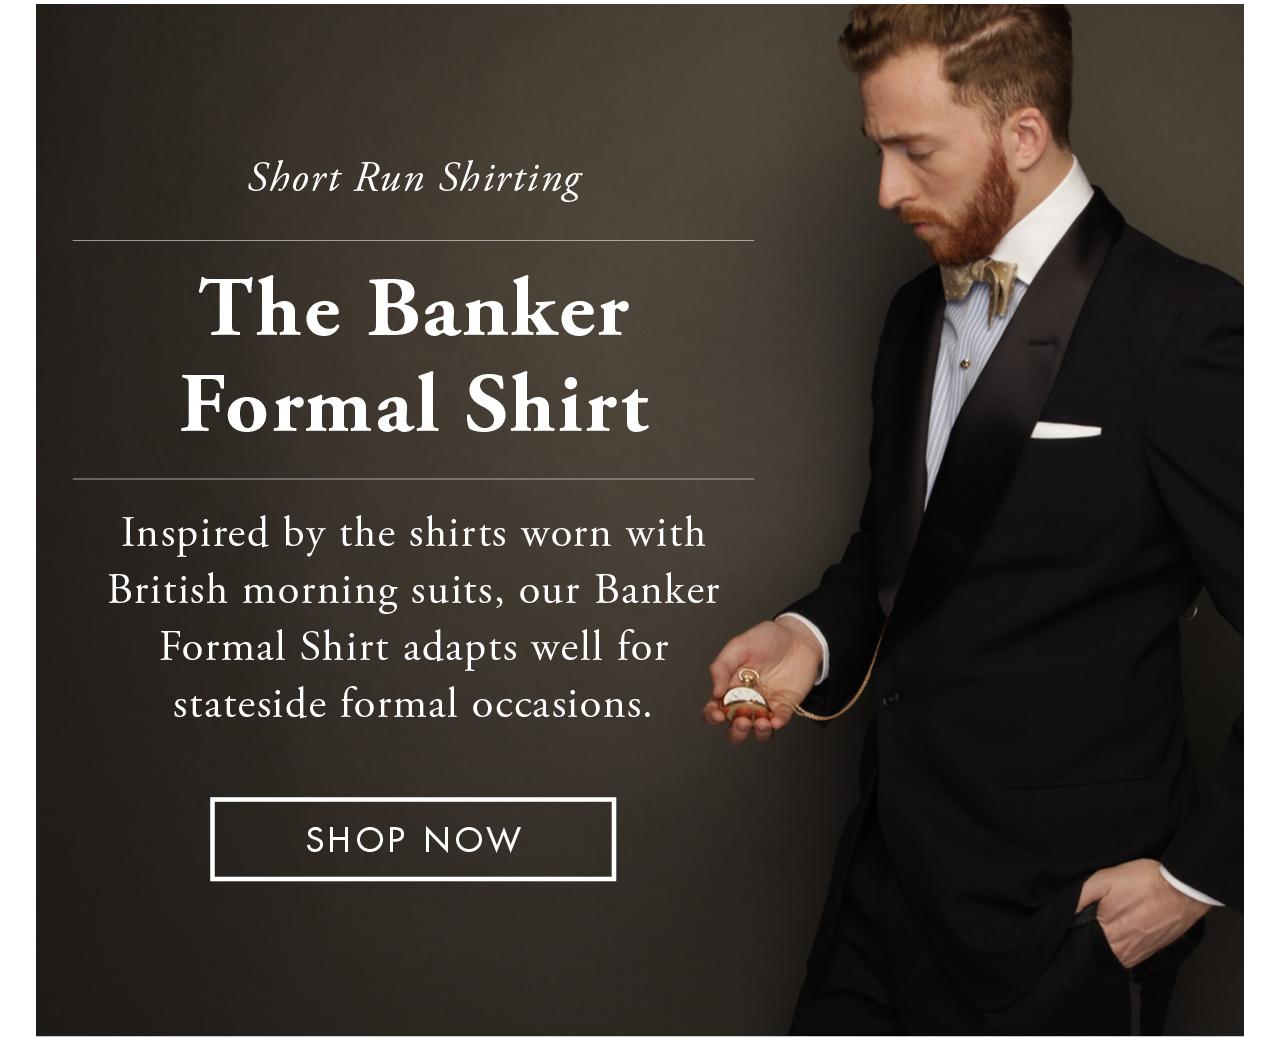 Short Run January - The Tuxedo Collection